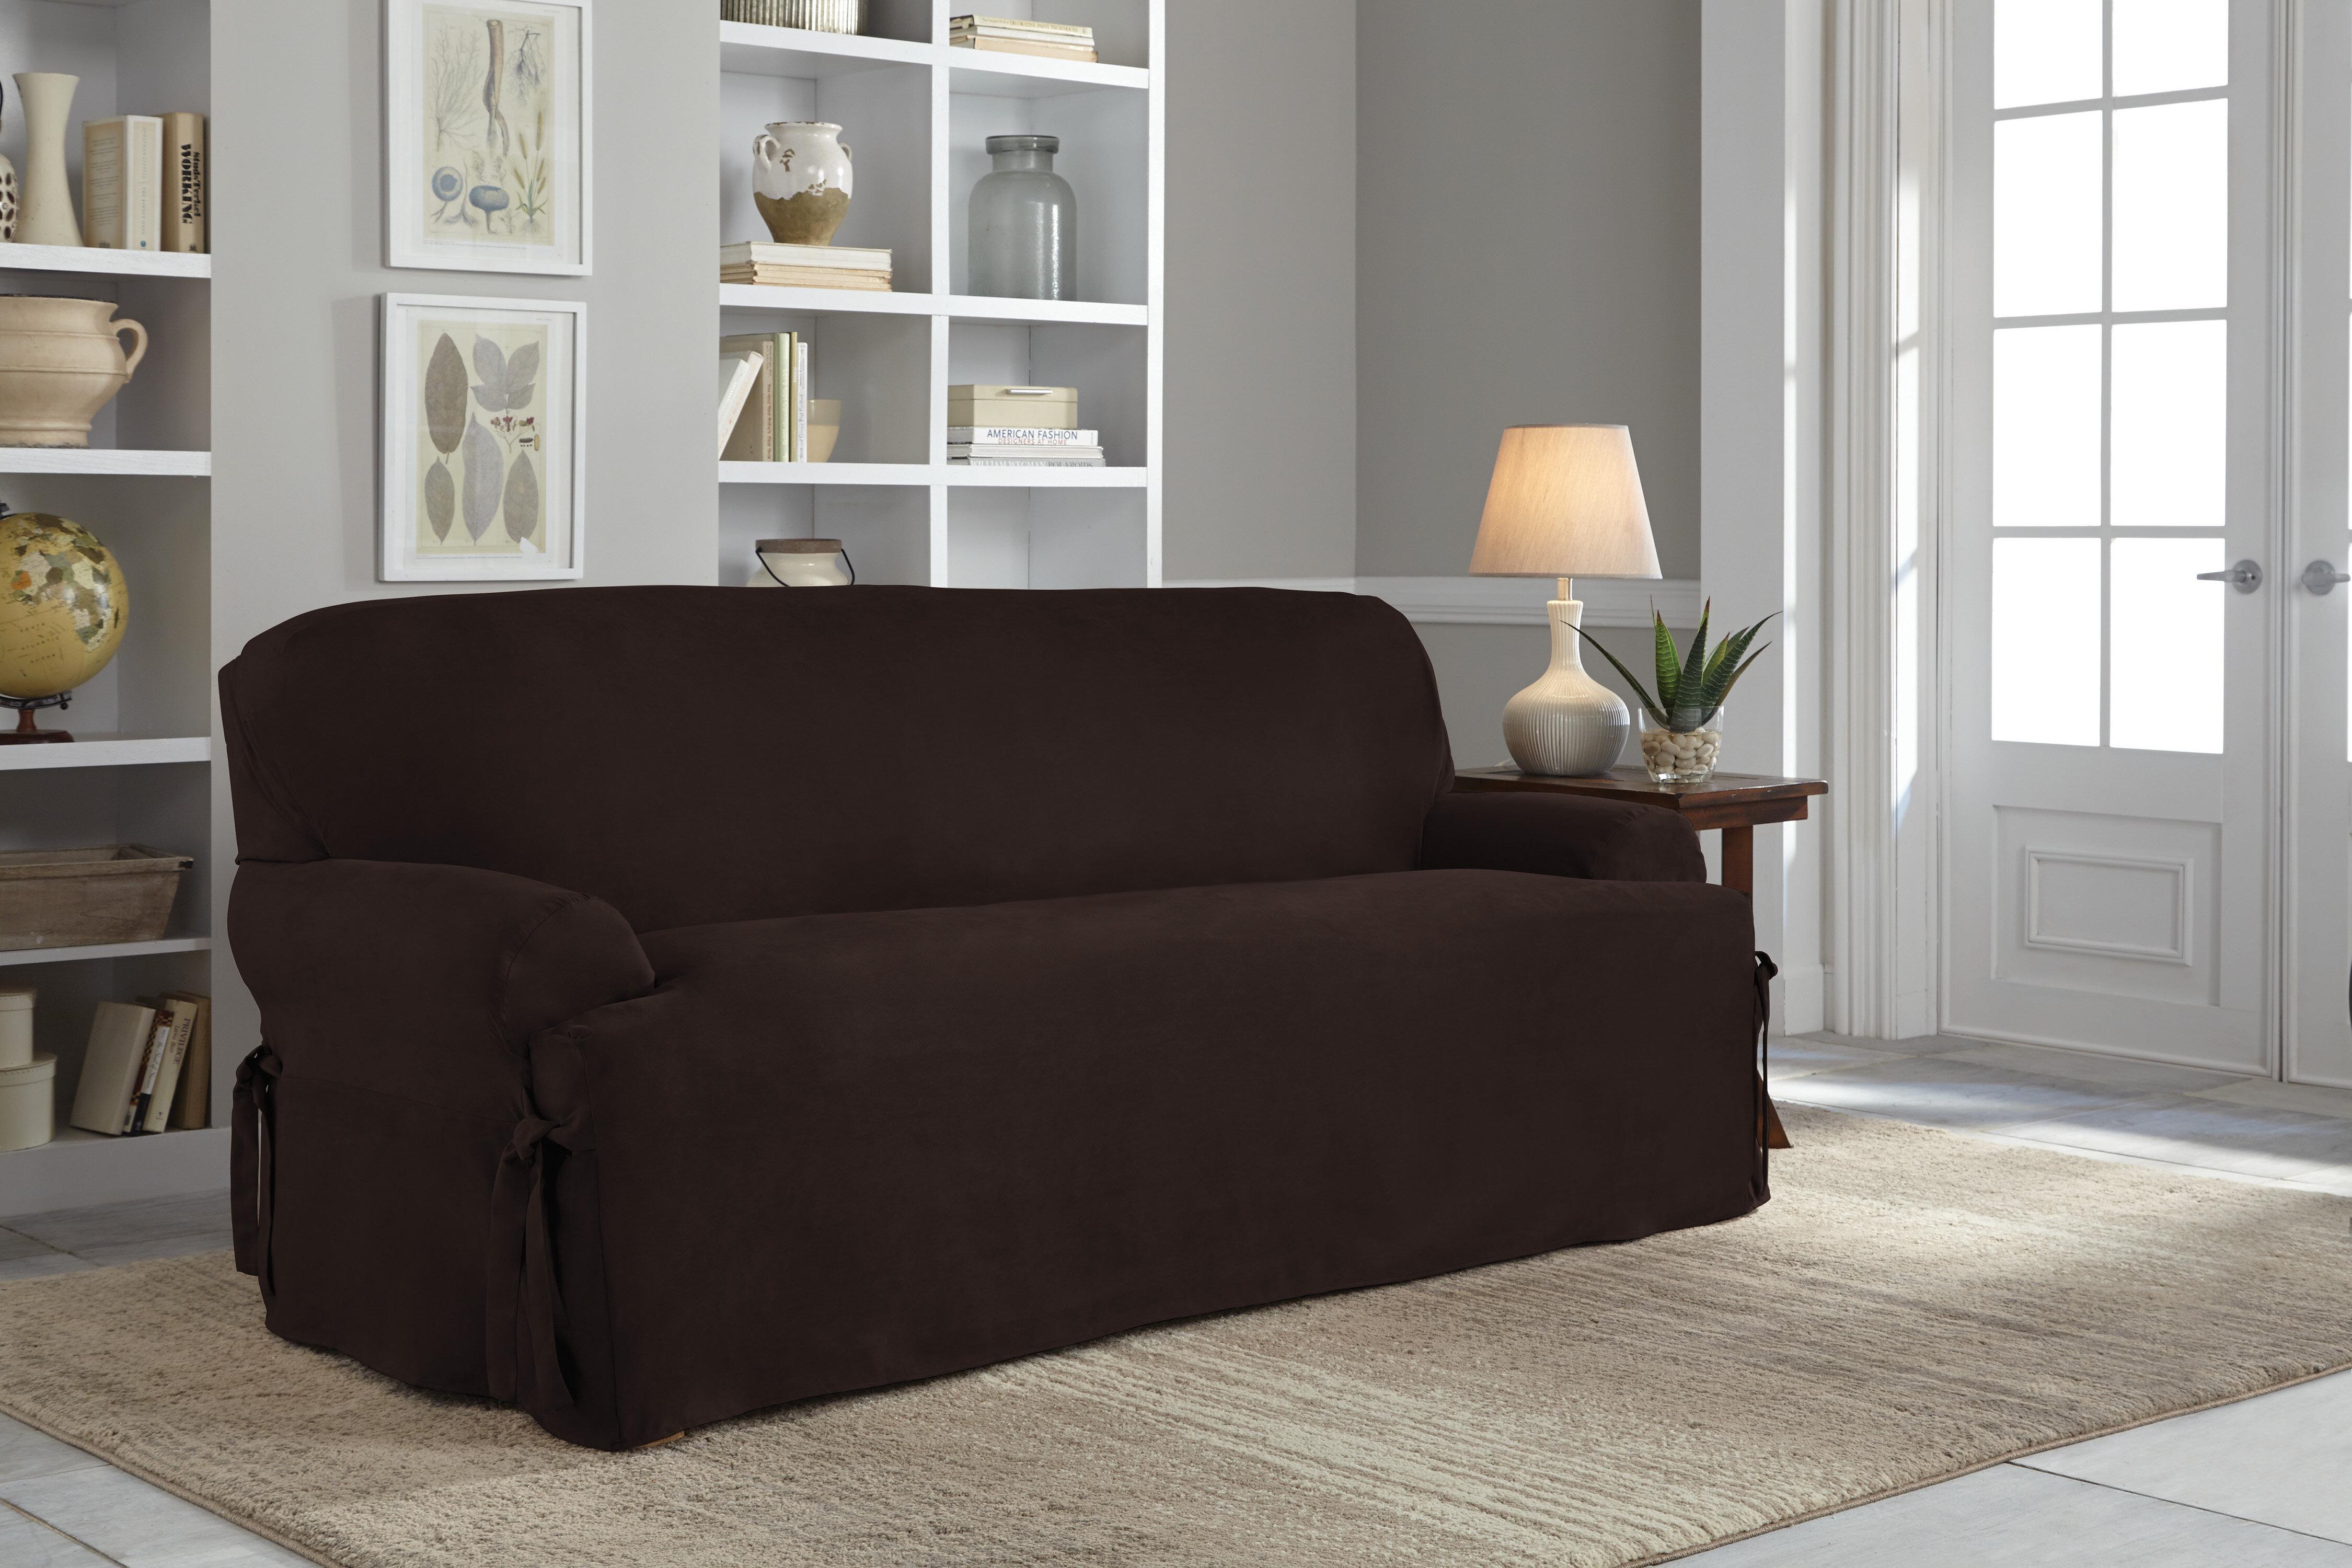 Unique sofa T Cushion Slipcover